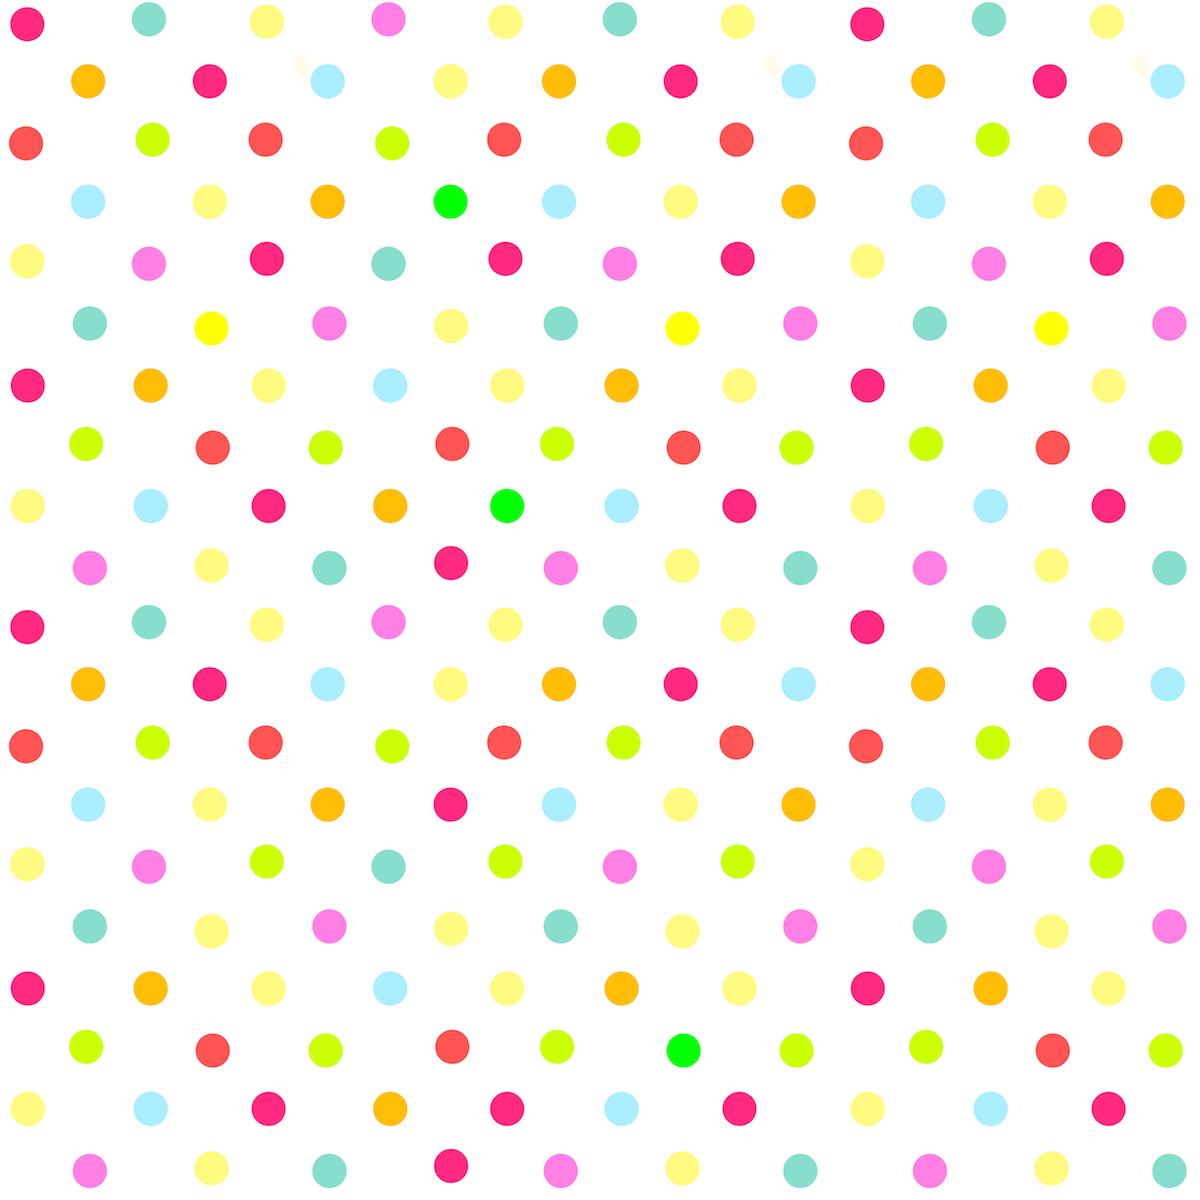 Free Polka Dot Background PNG - 153090